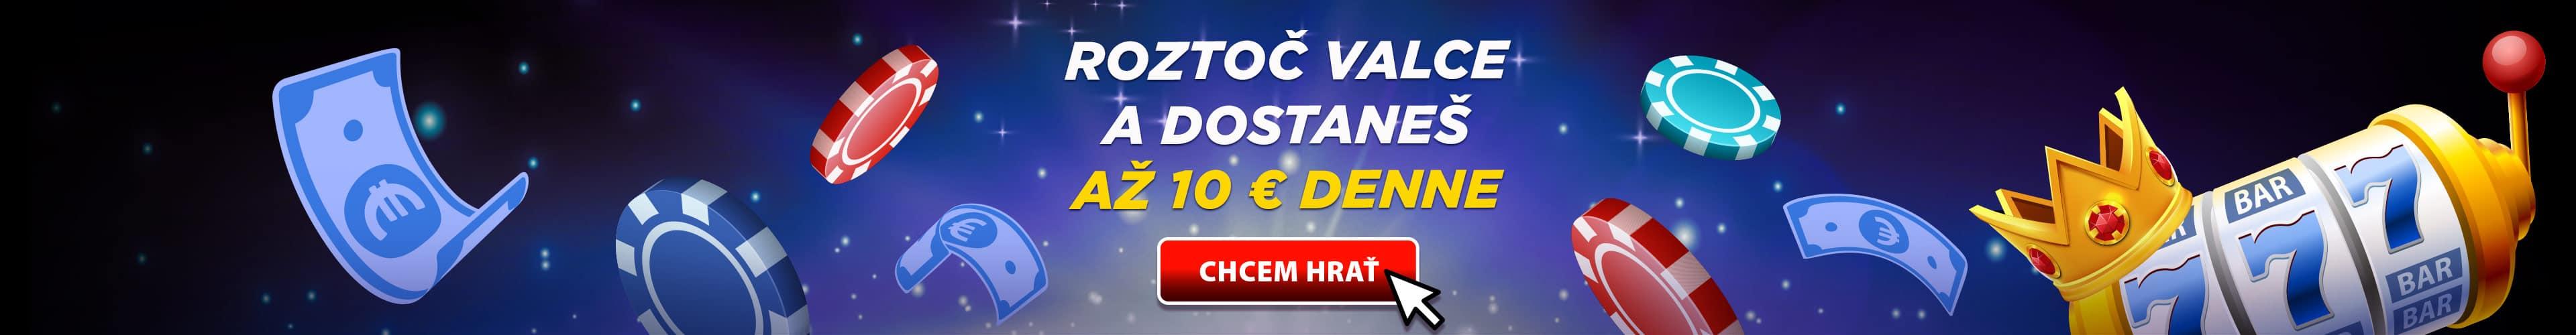 Roztočte valce a dostanete 10 Eur denne od eTIPOS.sk